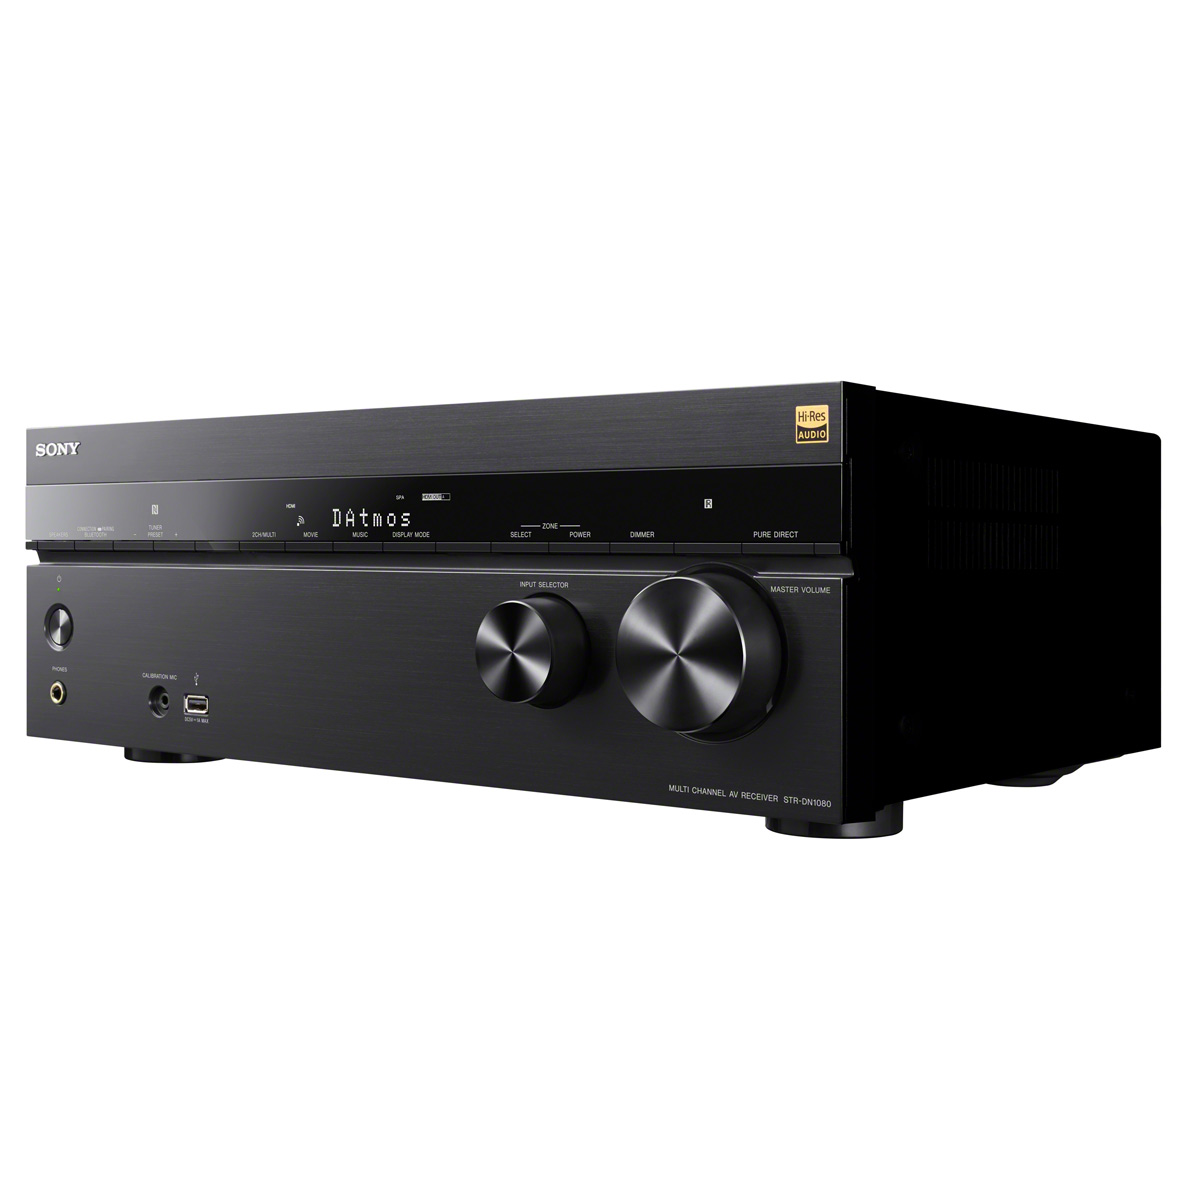 Sony 7 2 Channel Dolby Atmos Wi-Fi Network AV Receiver - STR-DN1080